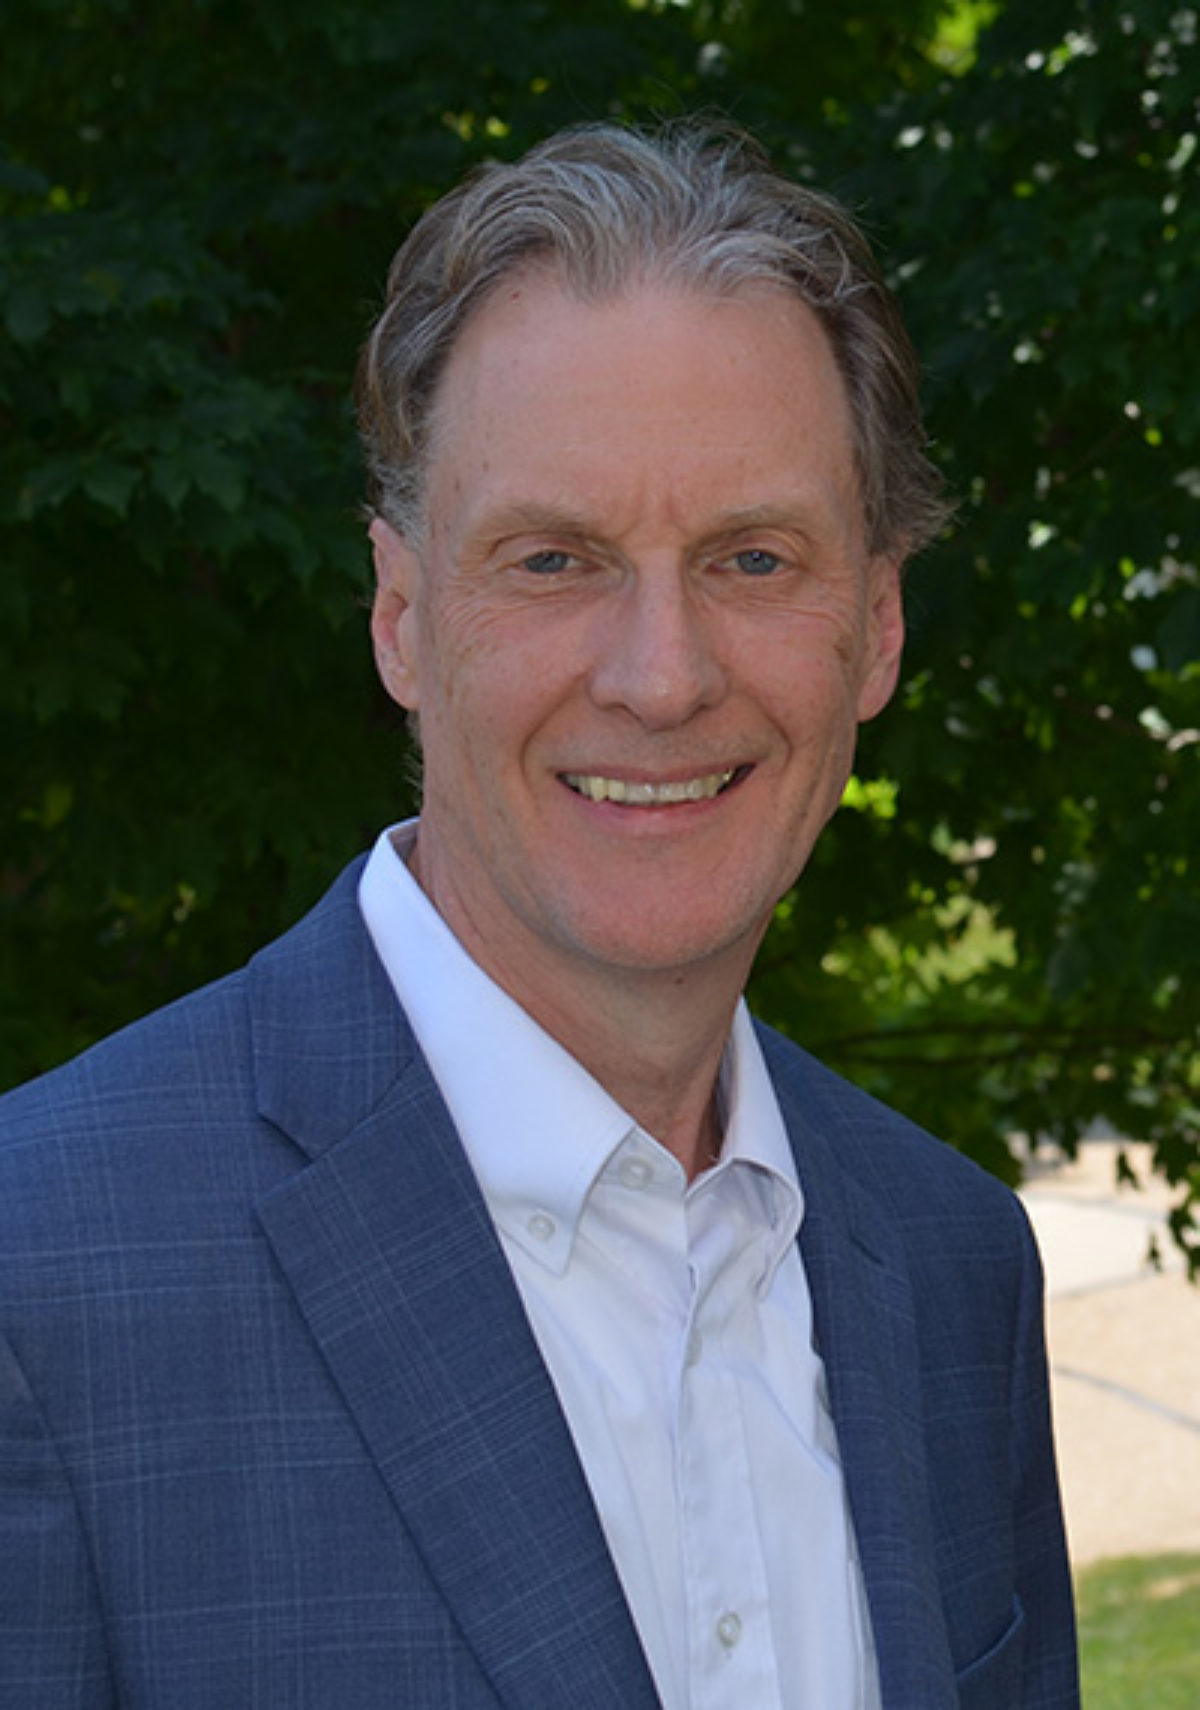 Darrell Zimmerman